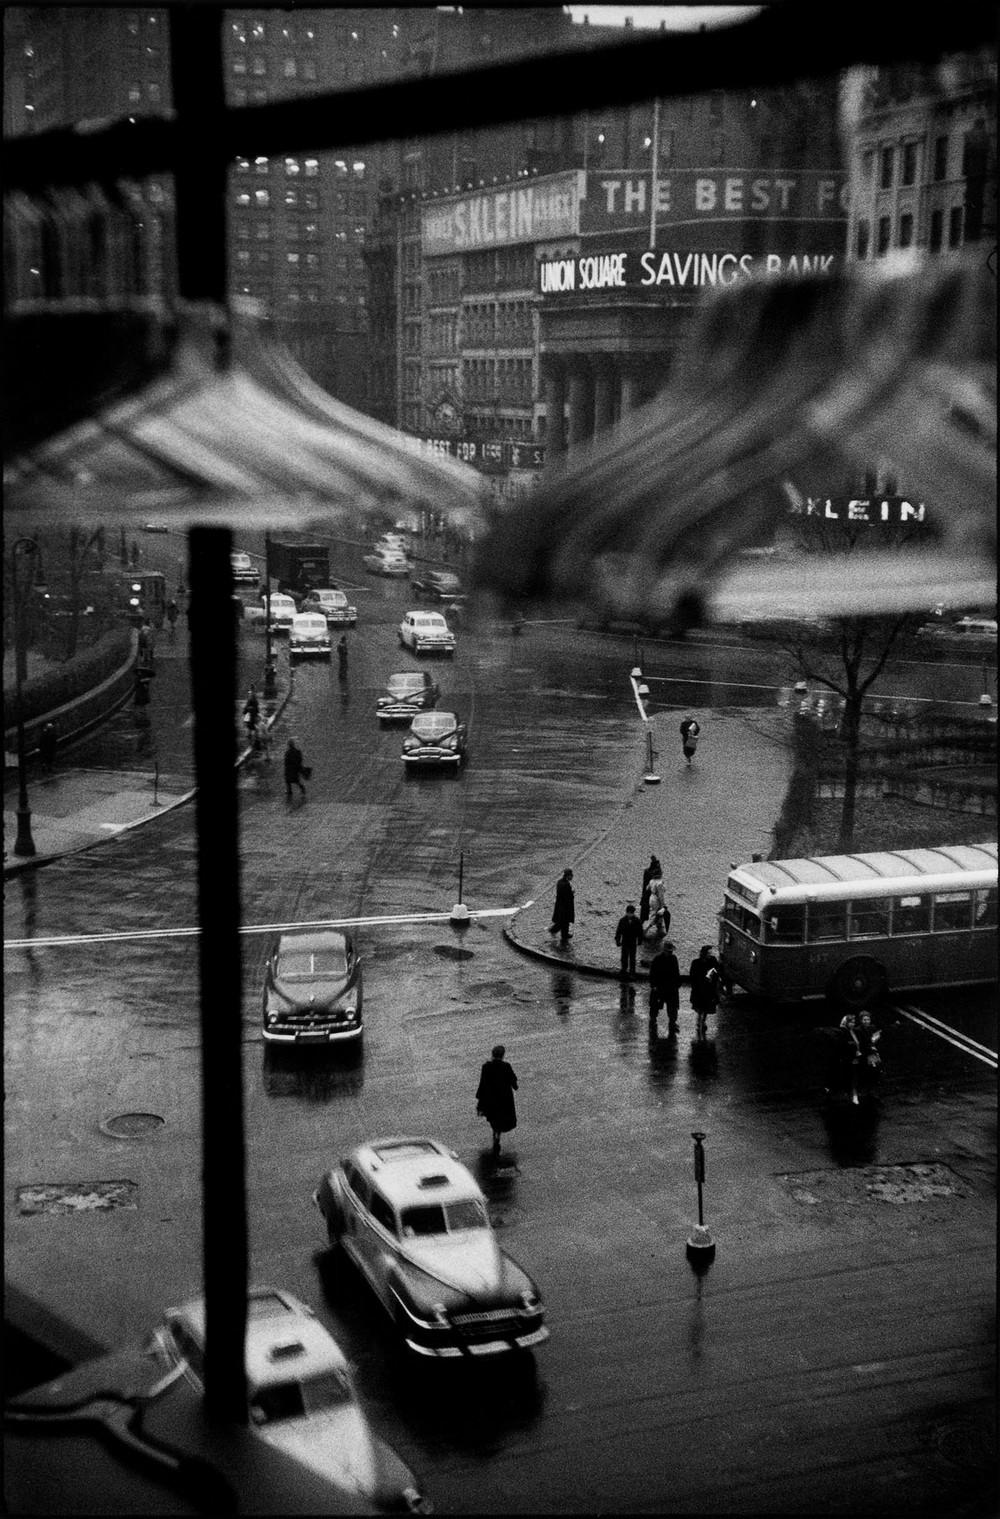 Луи Фаурер – лирик с фотокамерой на улицах Нью-Йорка 14